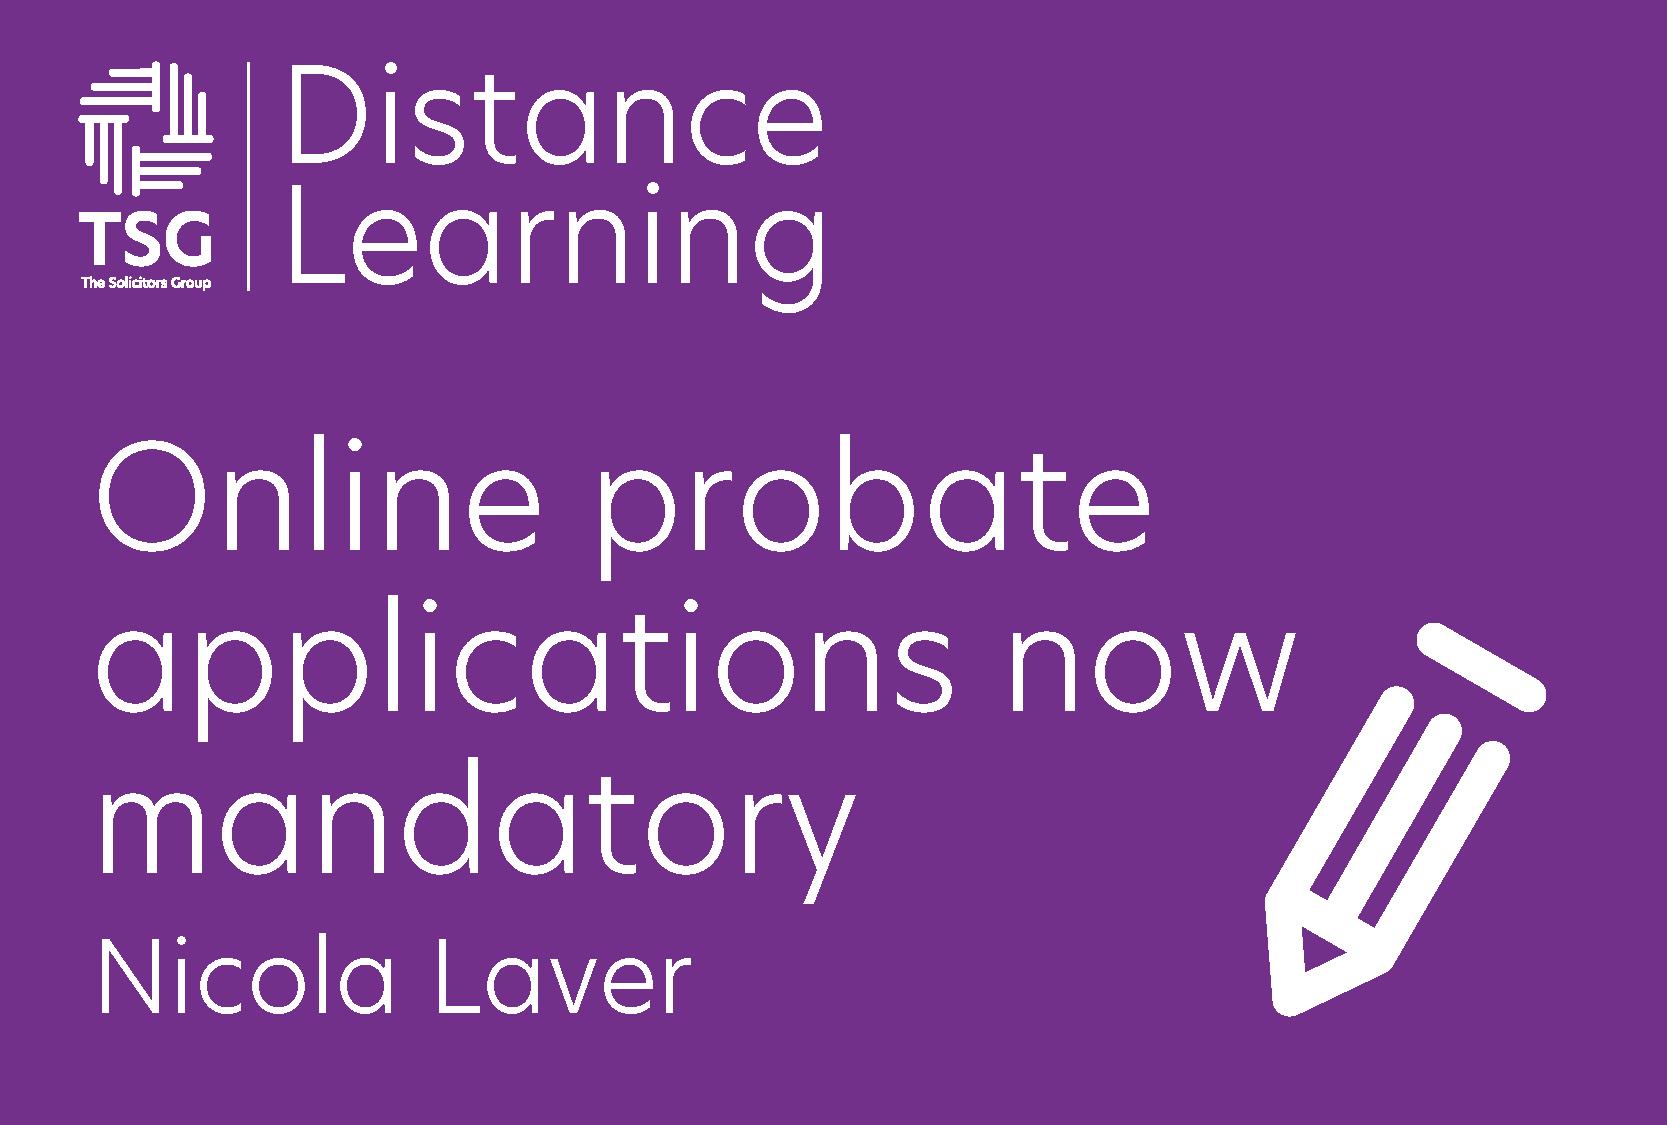 Online probate applications now mandatory